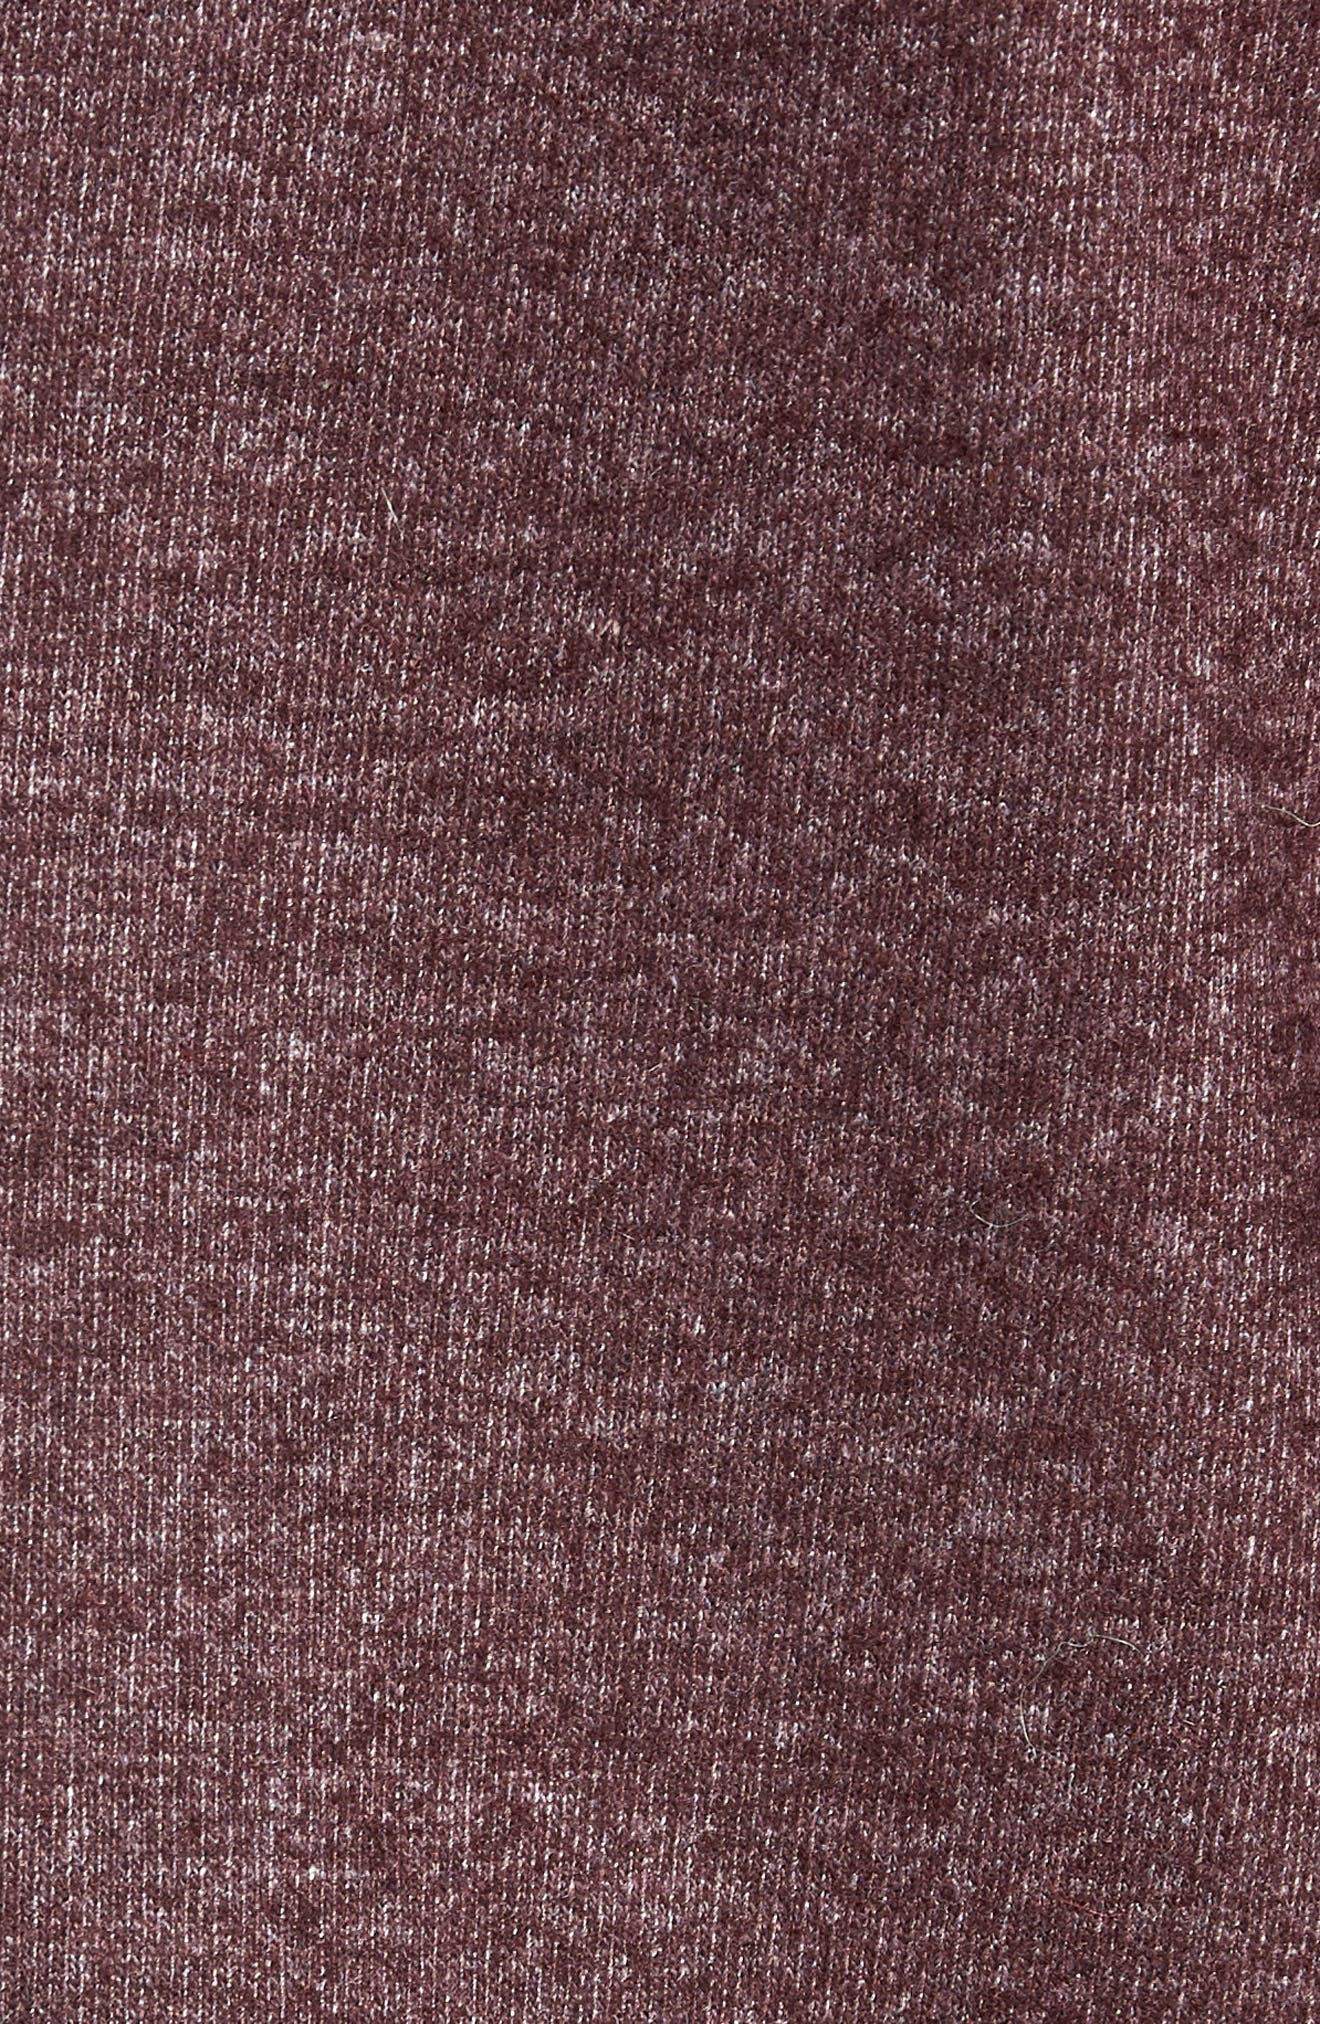 Regular Fit Knit Wool Blend Sport Coat,                             Alternate thumbnail 6, color,                             PORT